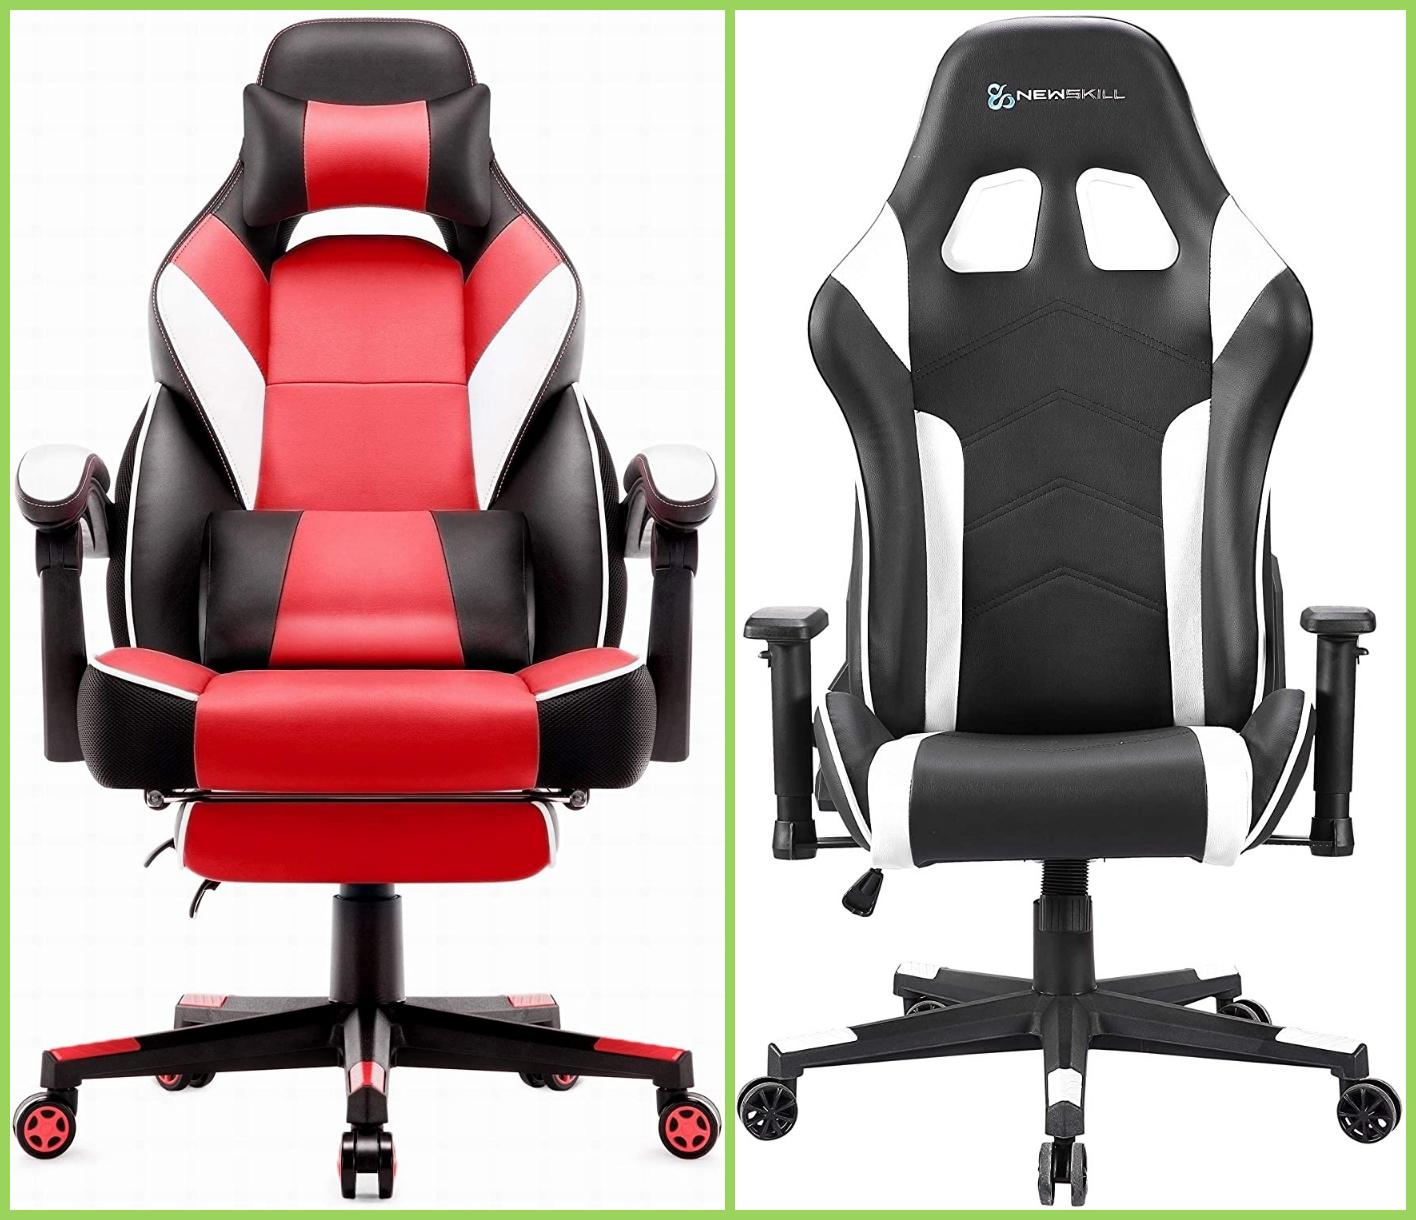 IntimaTe WM Heart vs Newskill, ¿cuál es la mejor silla gaming 2021?